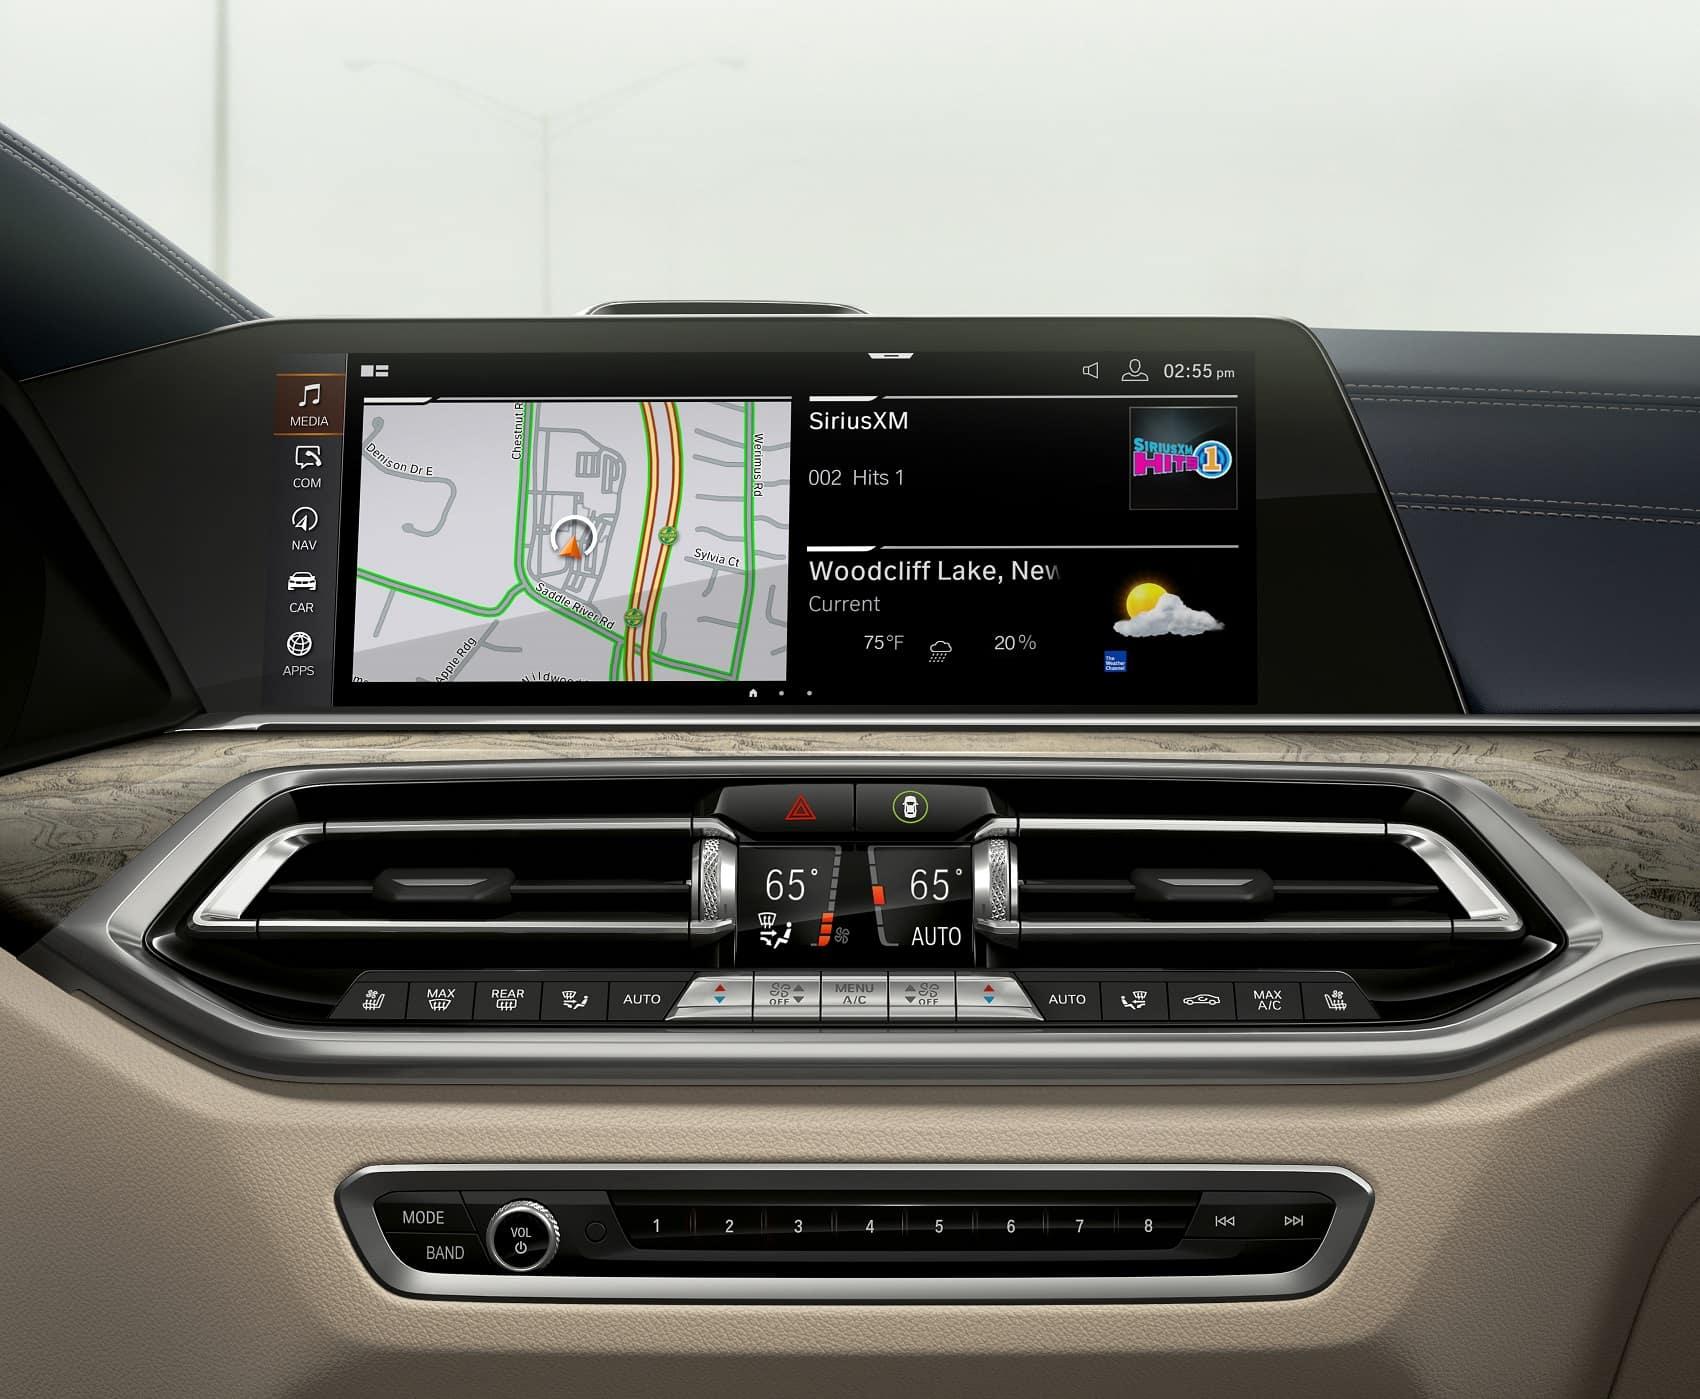 2019 BMW X7 Interior Infotainment System